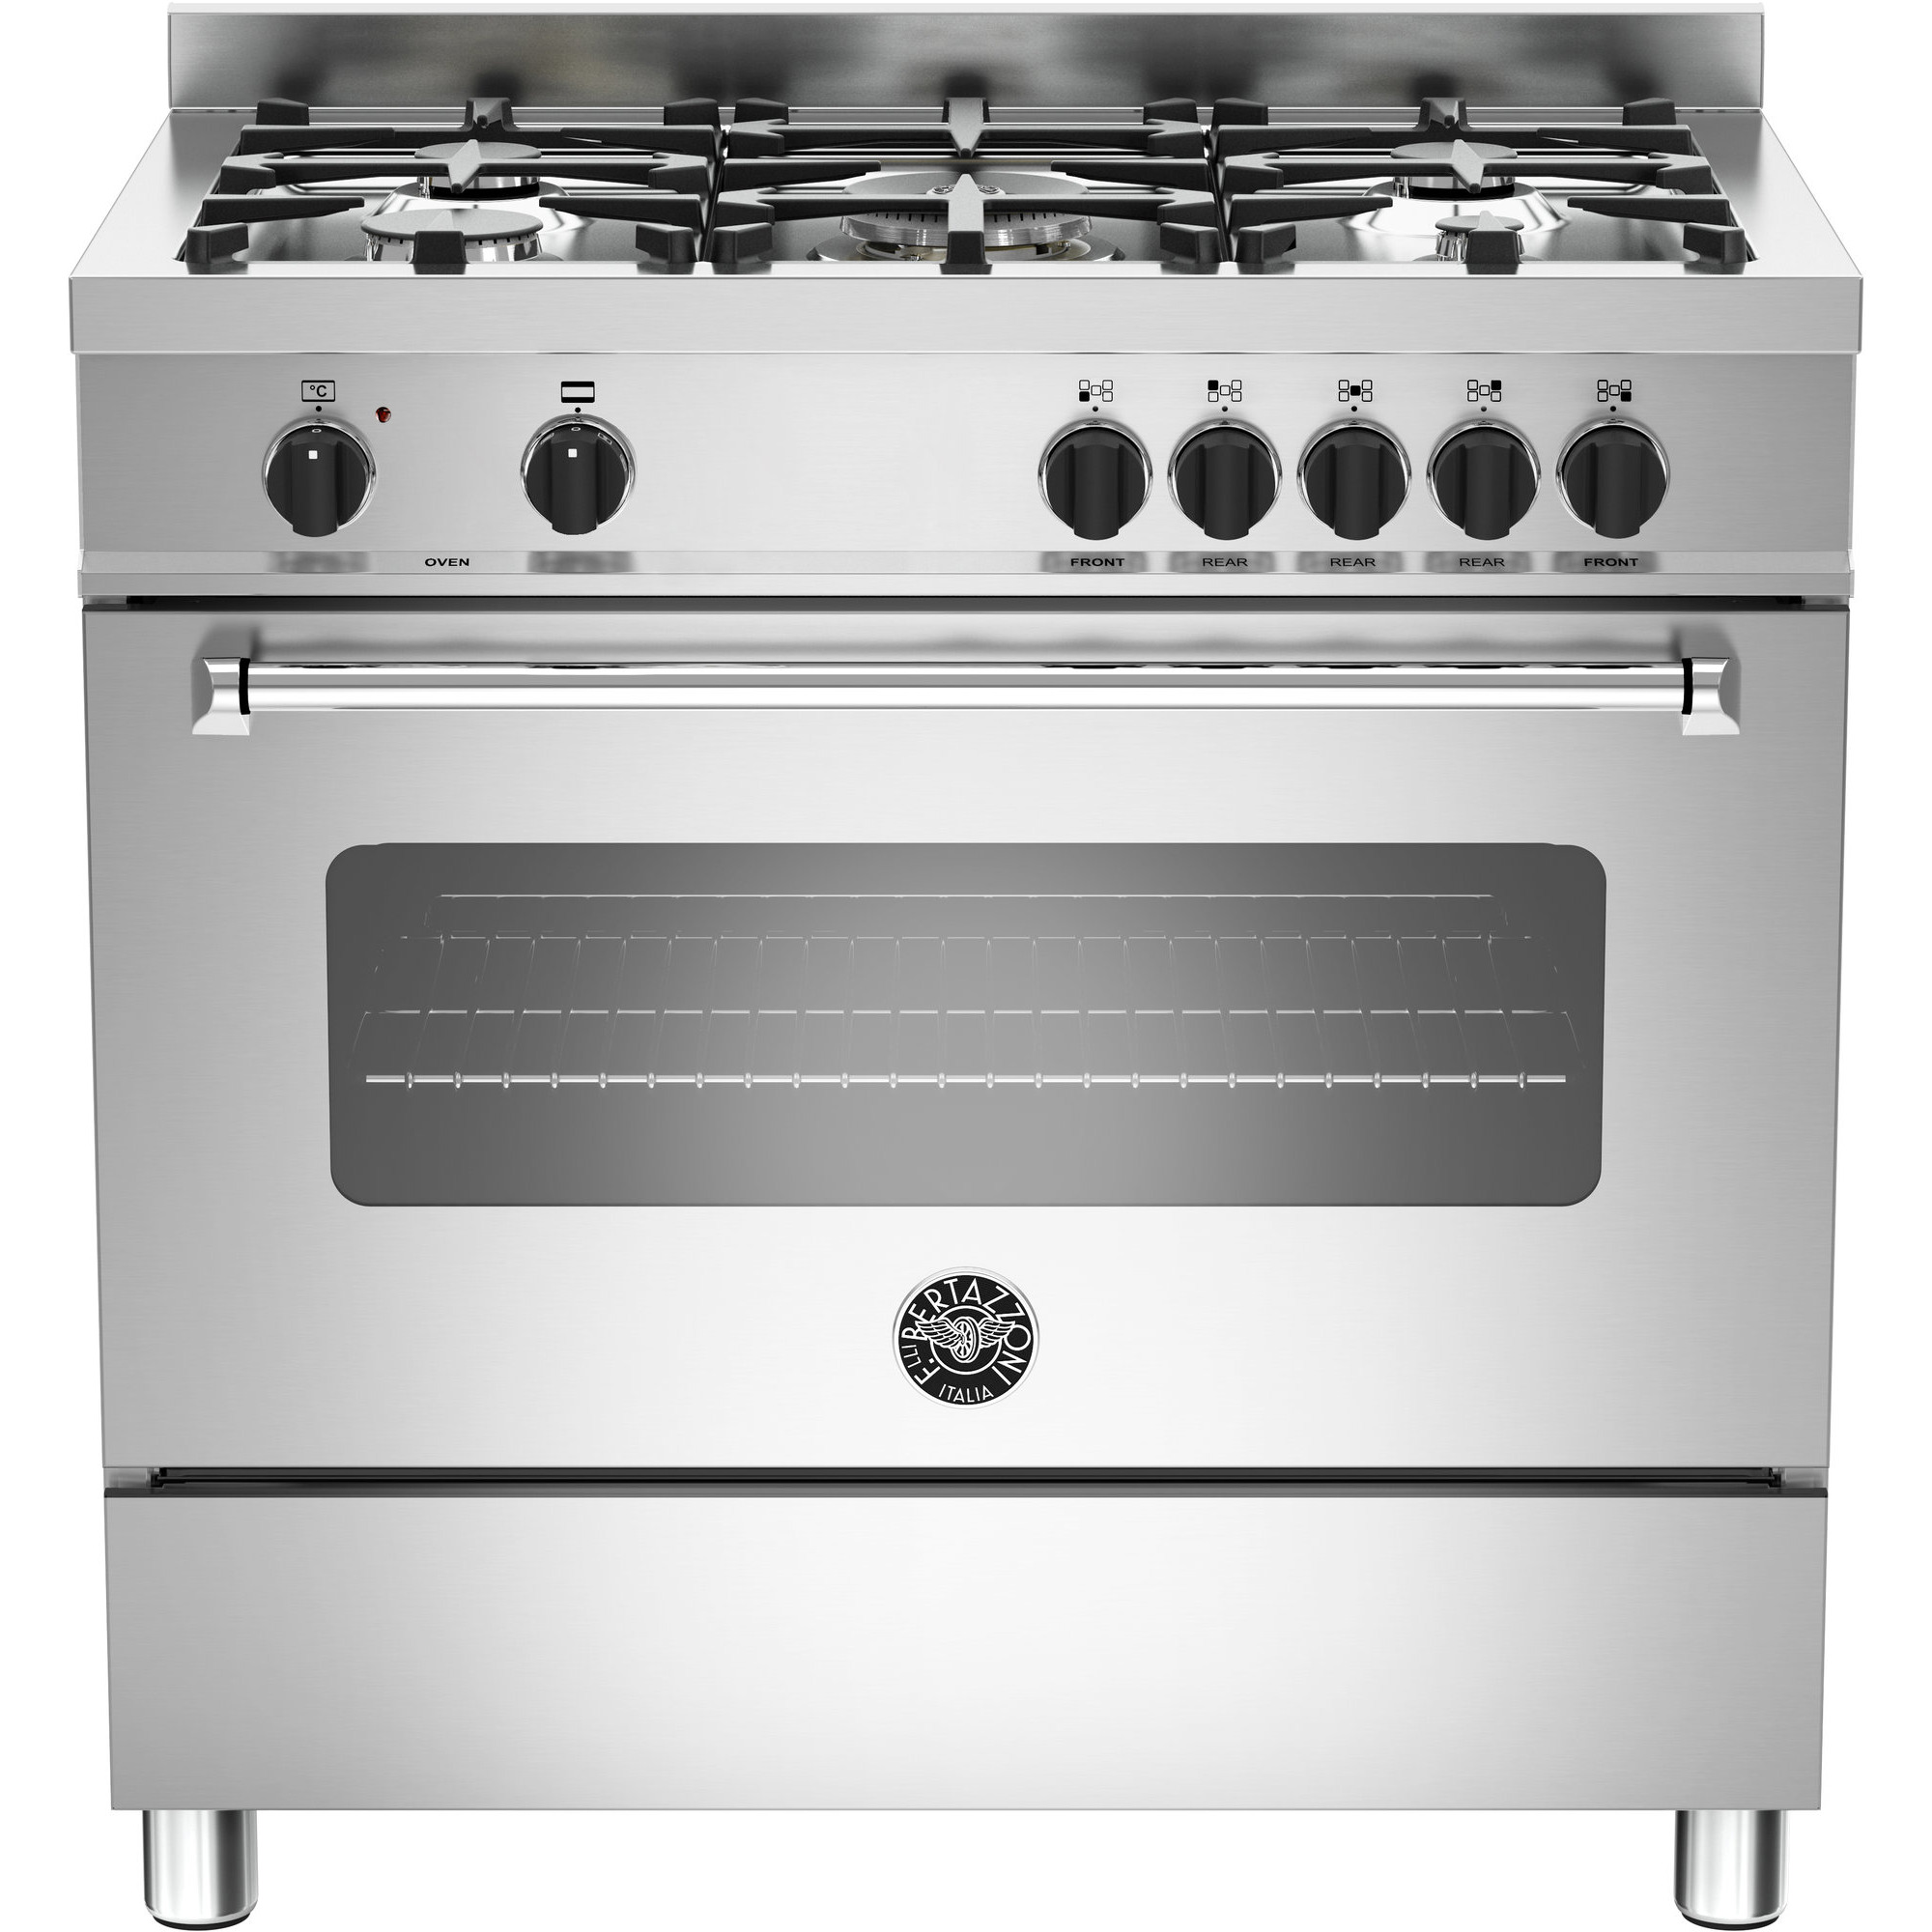 Bertazzoni MAS905 Gasspis 90 cm 1 ugn 5 brännare modell XE Rostfri